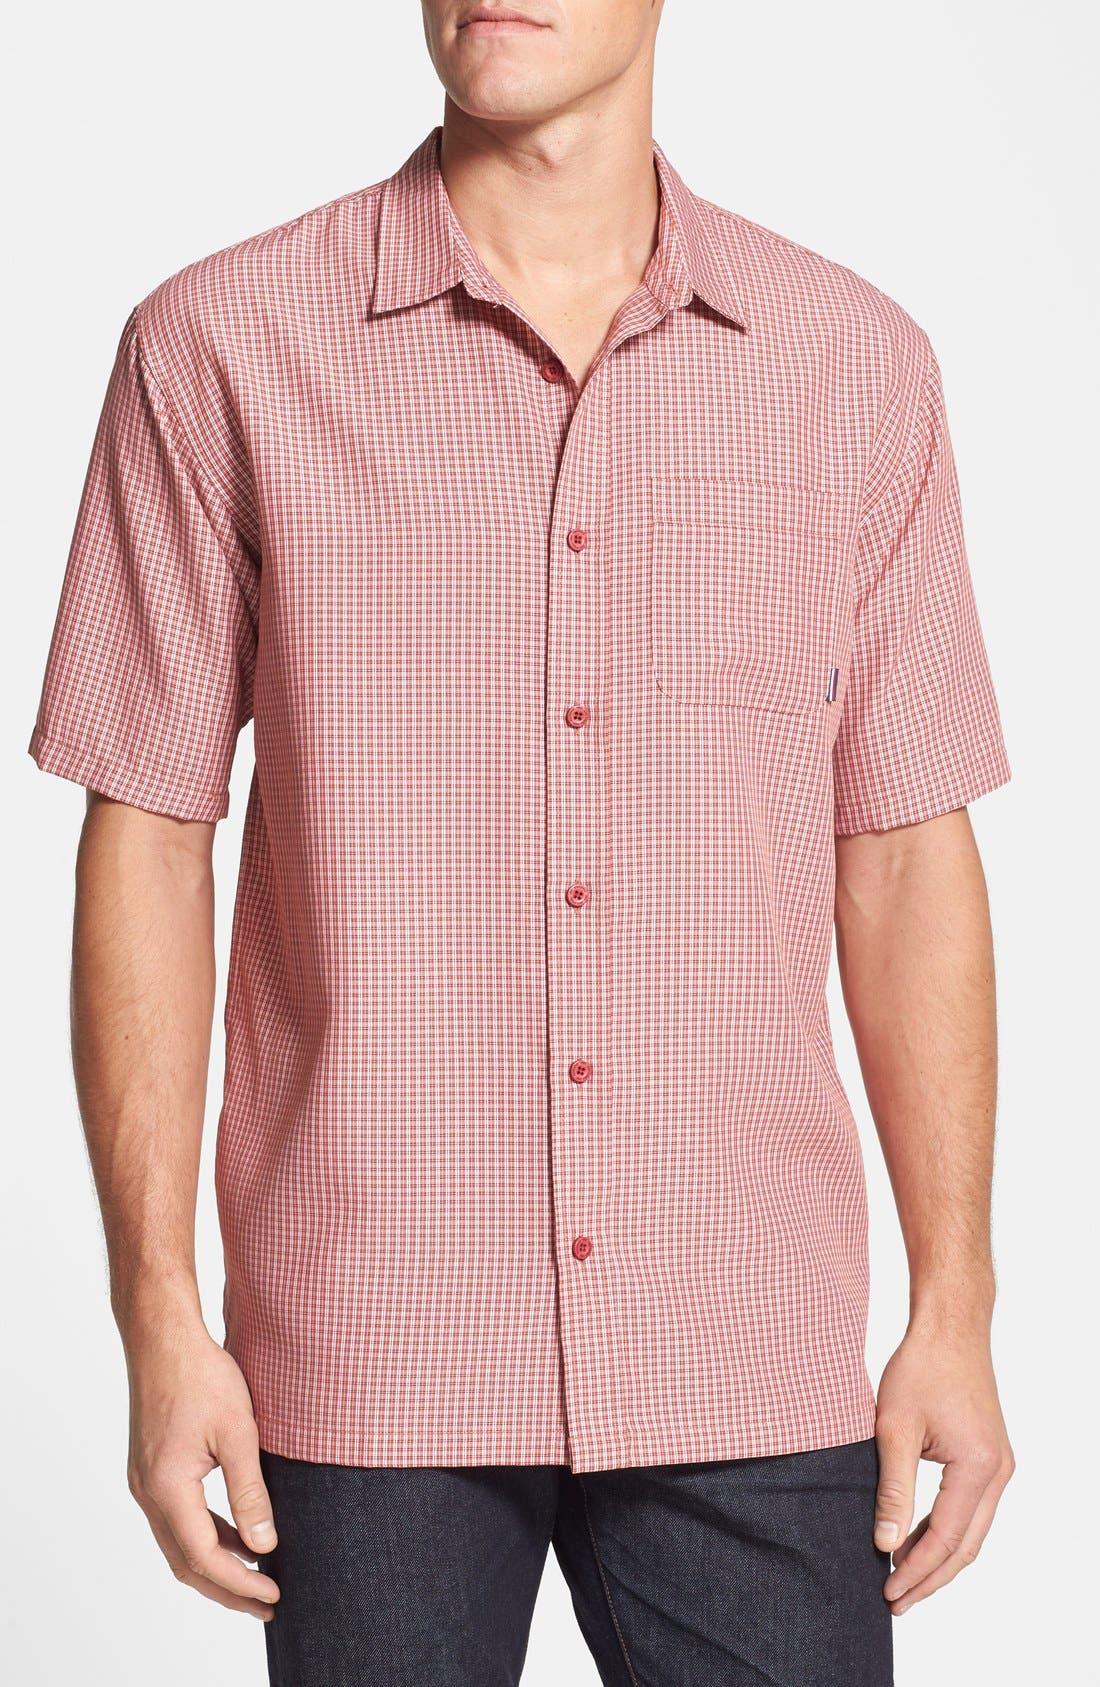 Main Image - Jack O'Neill 'Ford' Standard Fit Short Sleeve Woven Sport Shirt